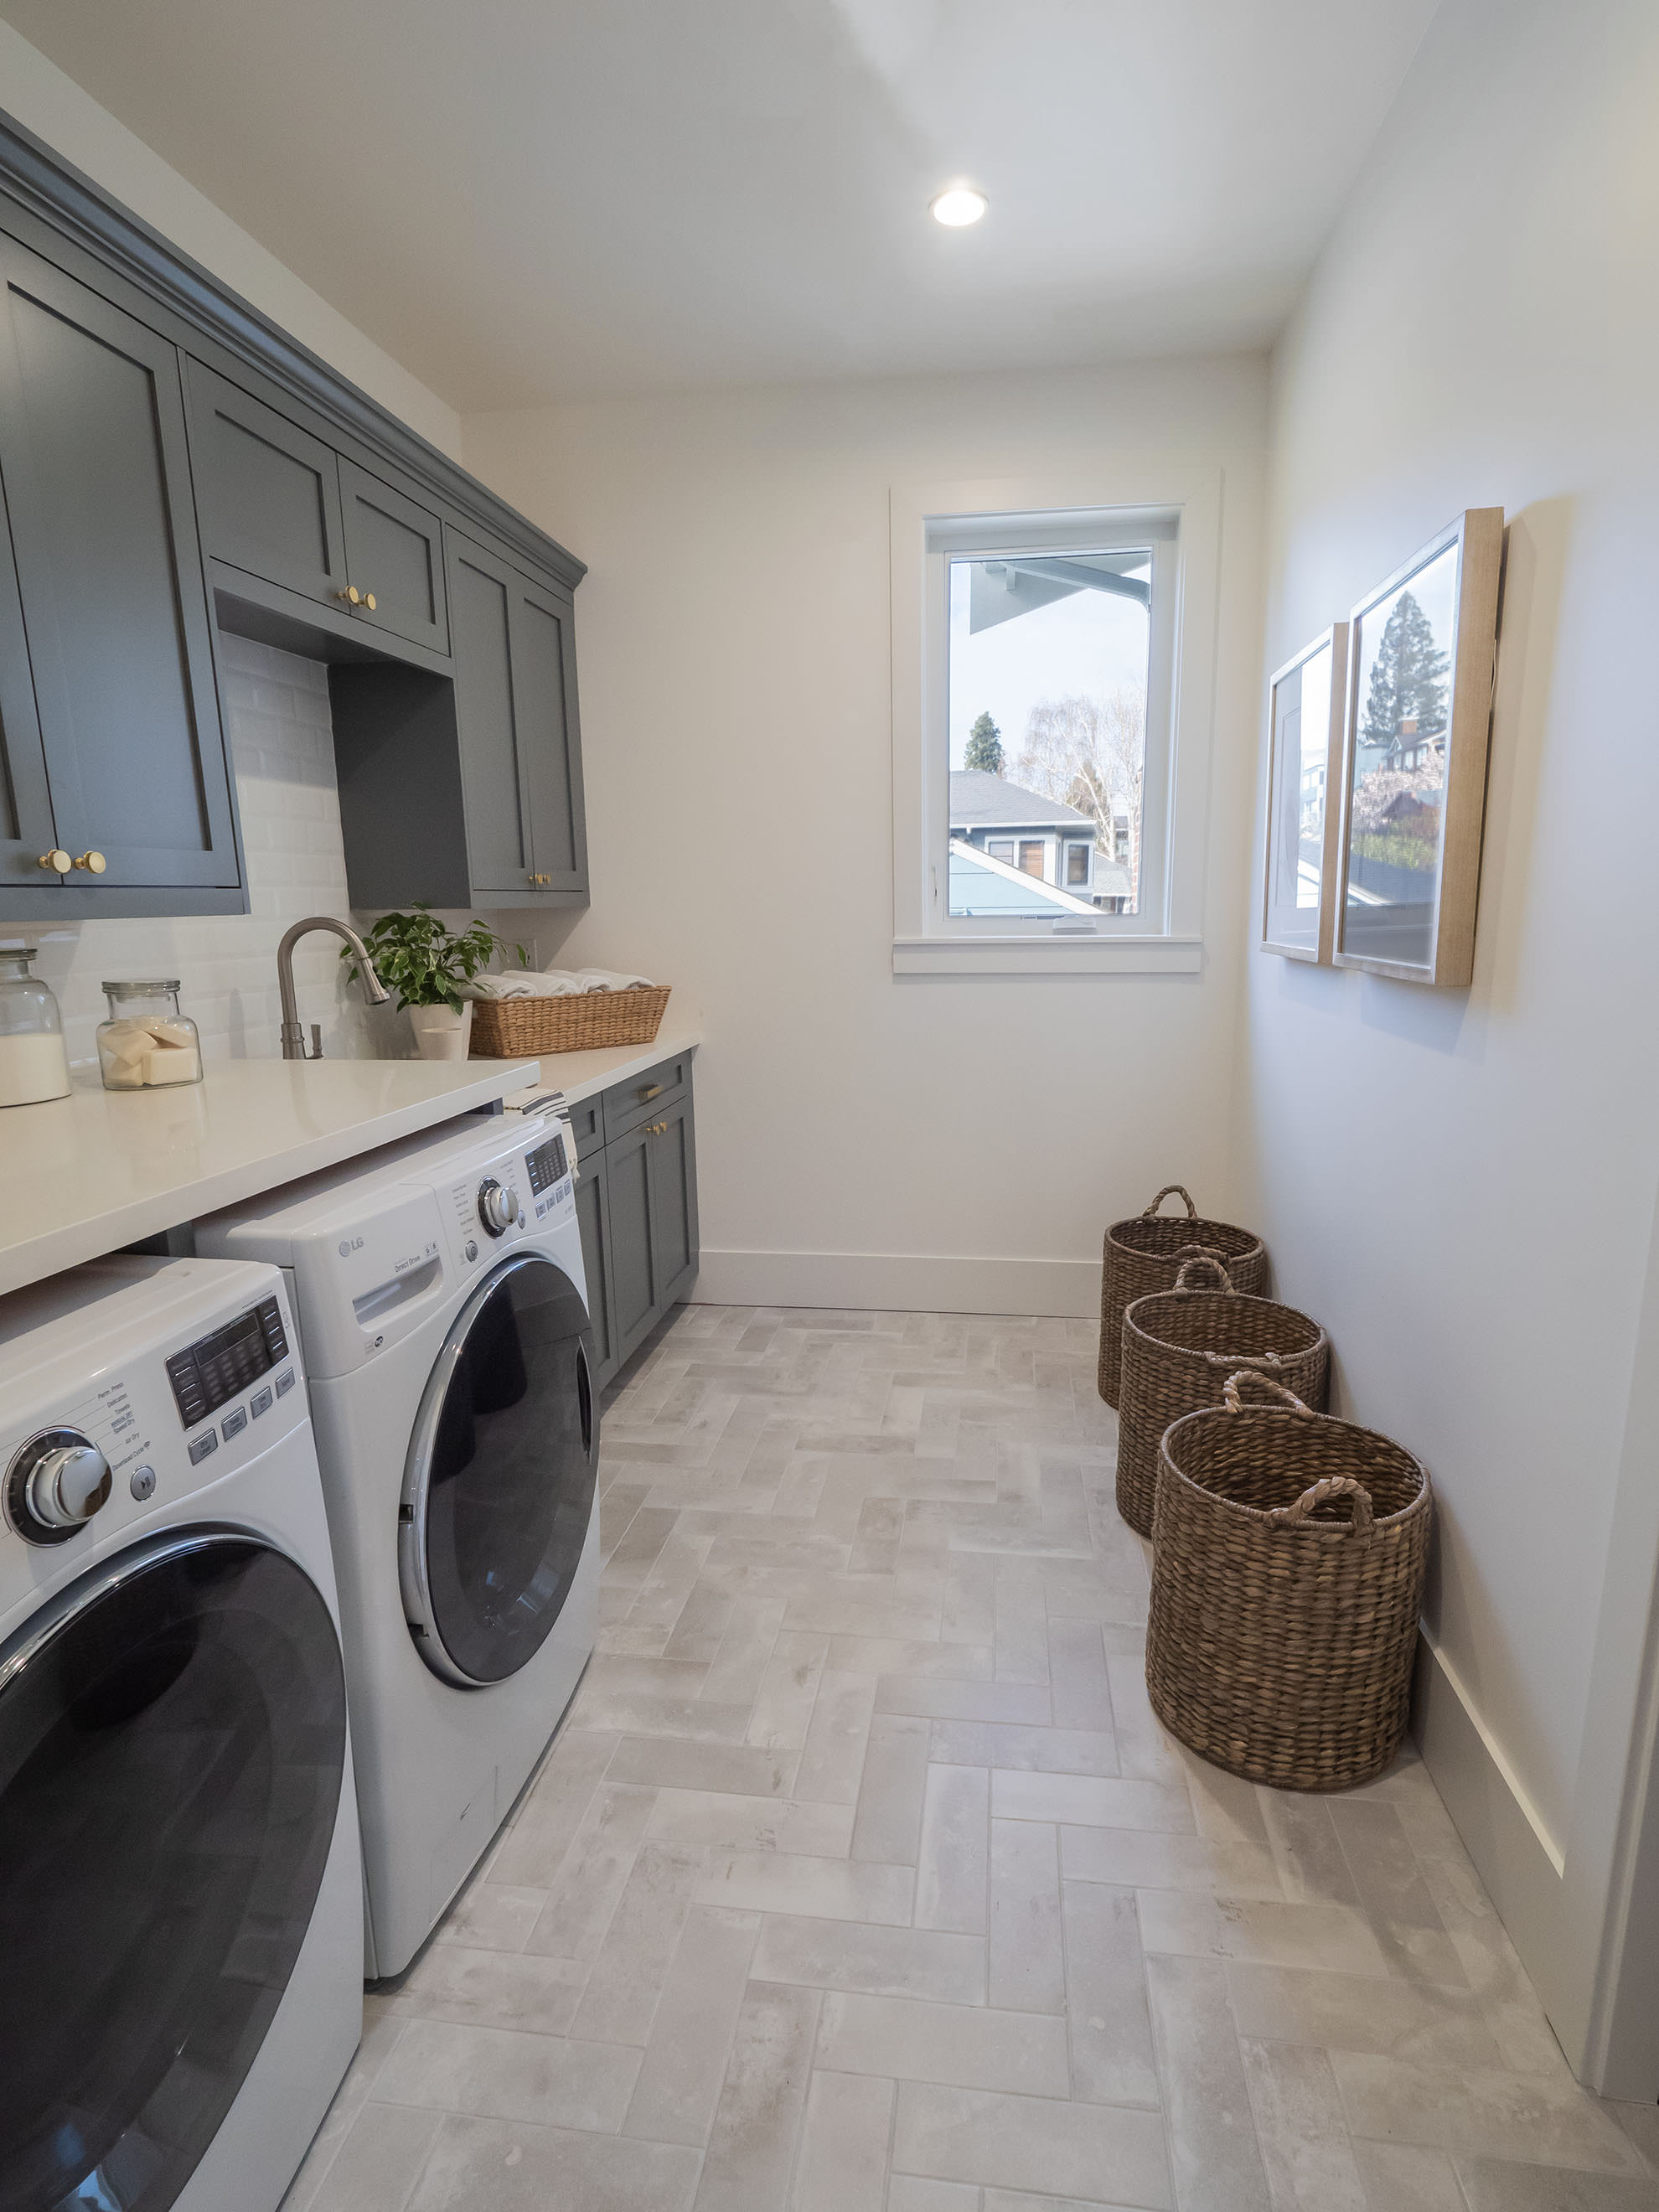 tnd-laundry-3280059.jpg